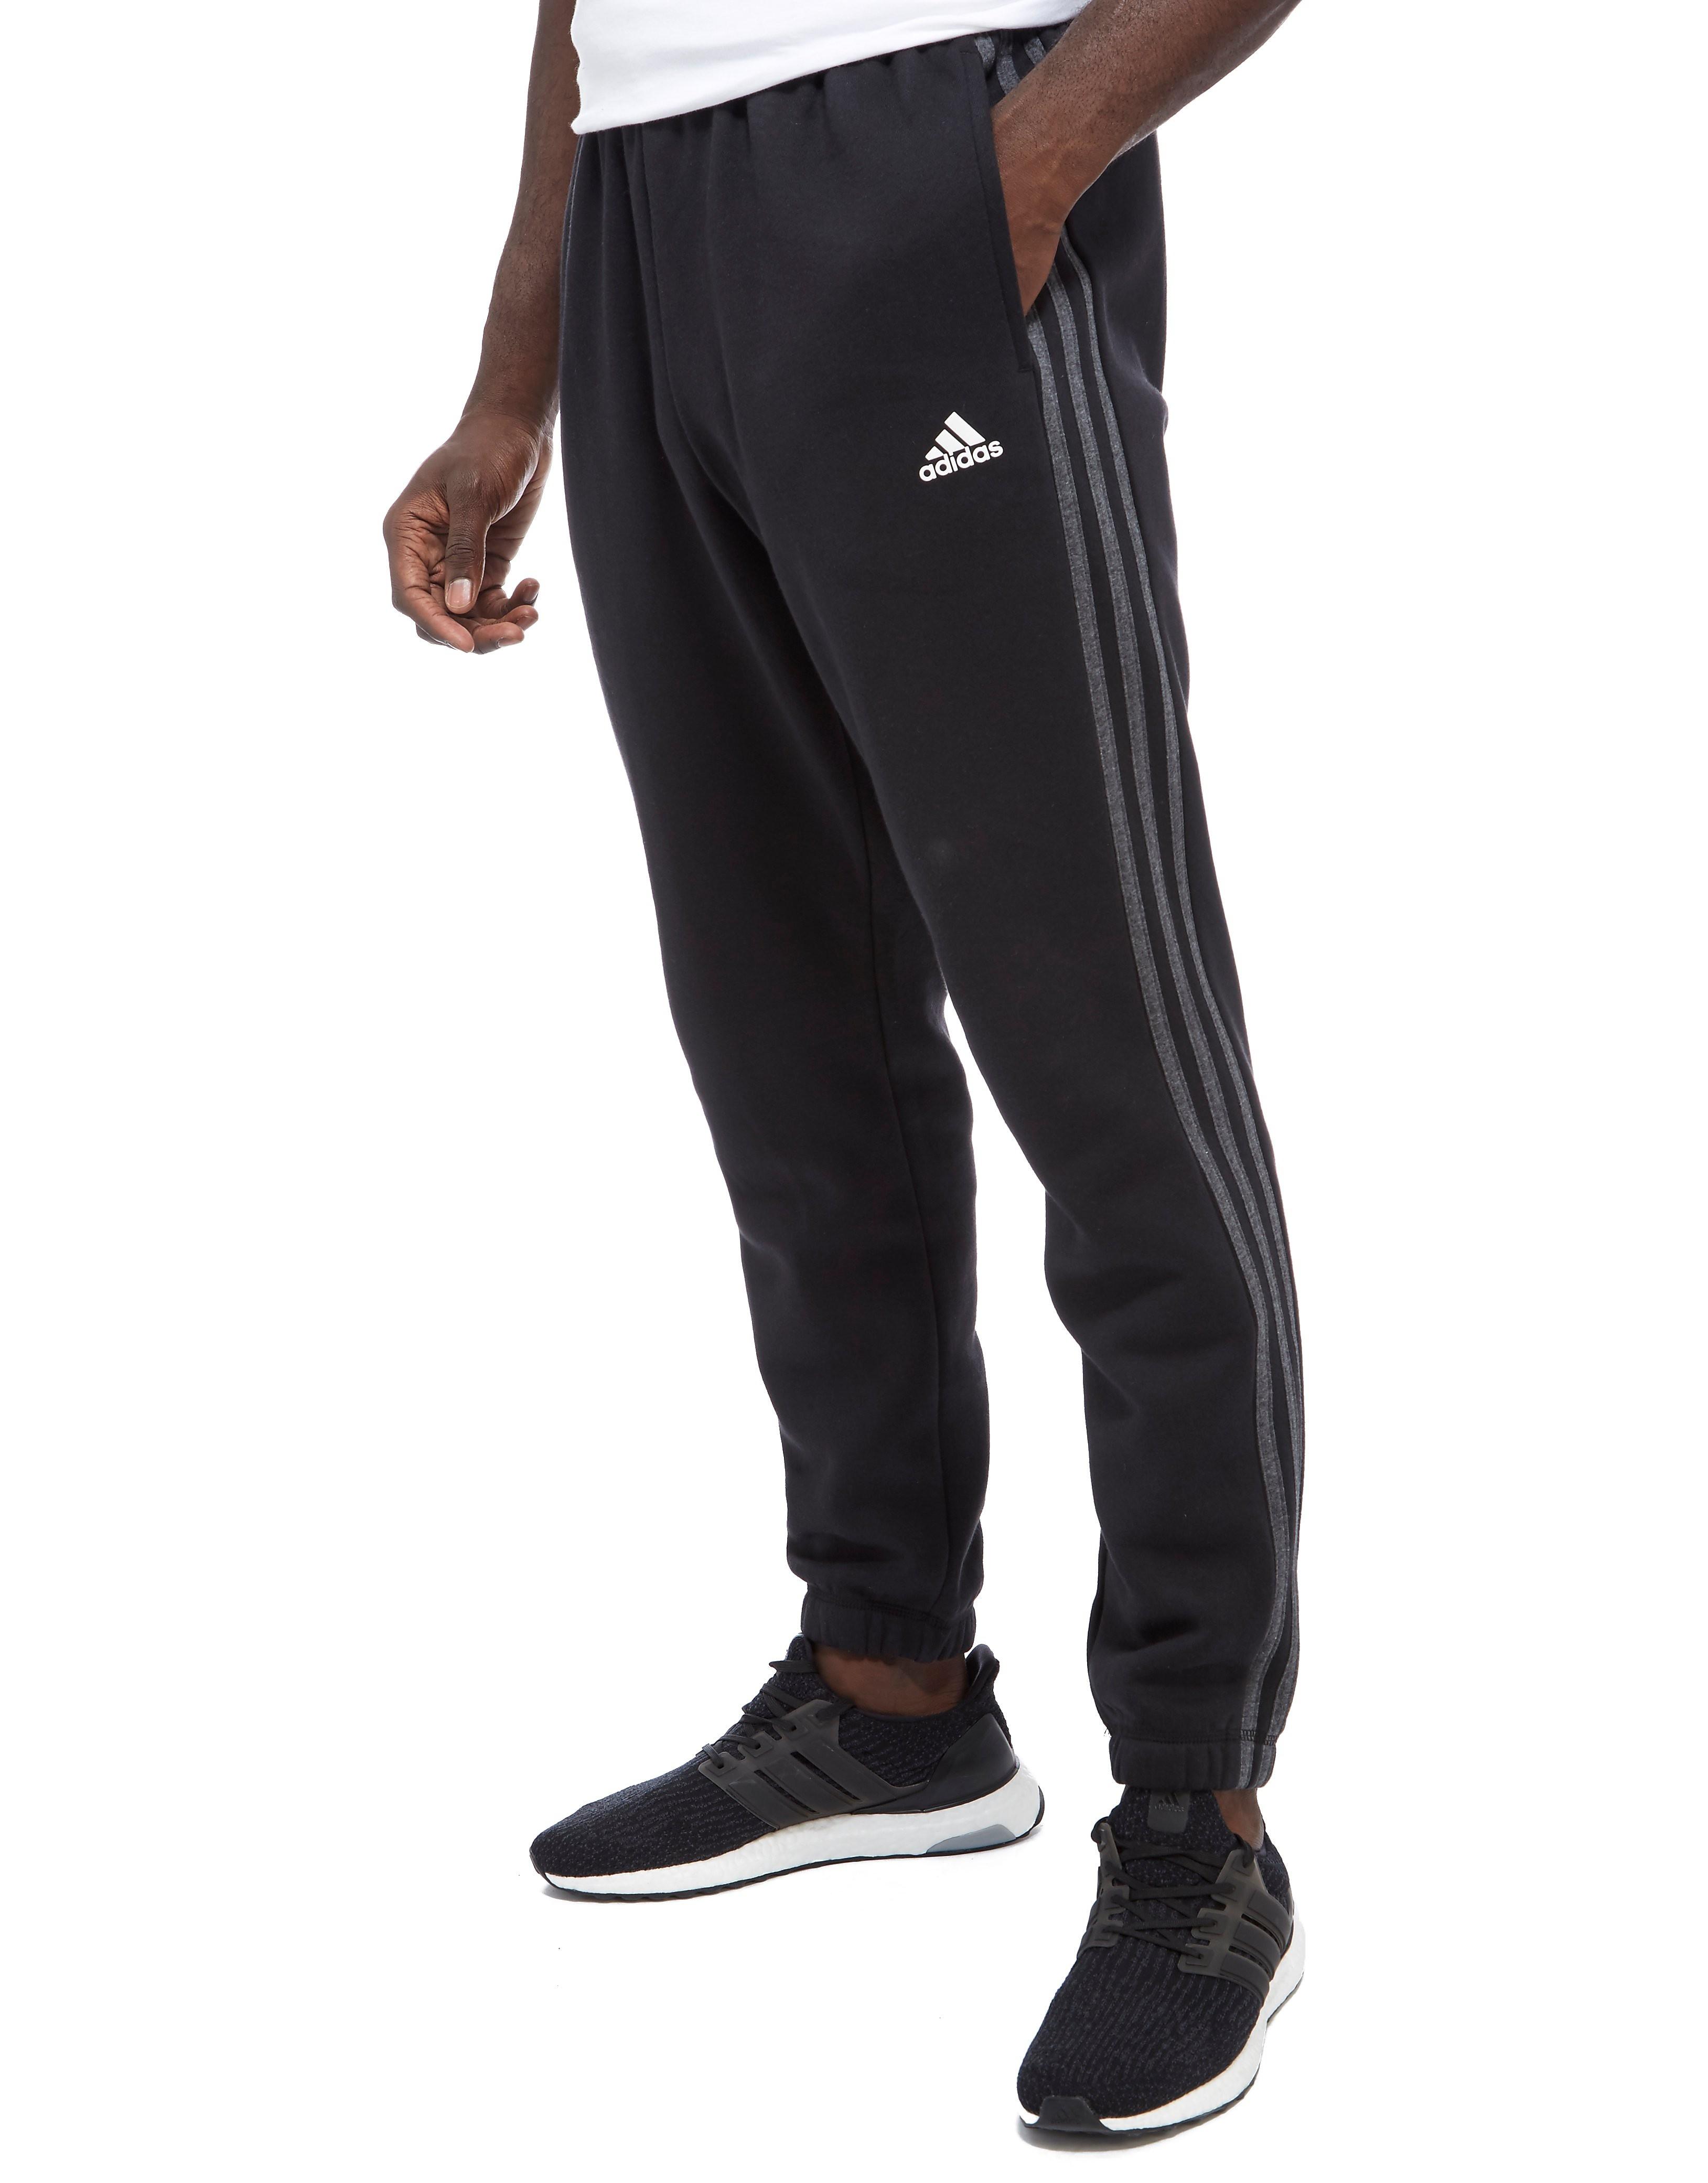 adidas 3-Stripes Essential Track Pants Heren - Zwart - Heren